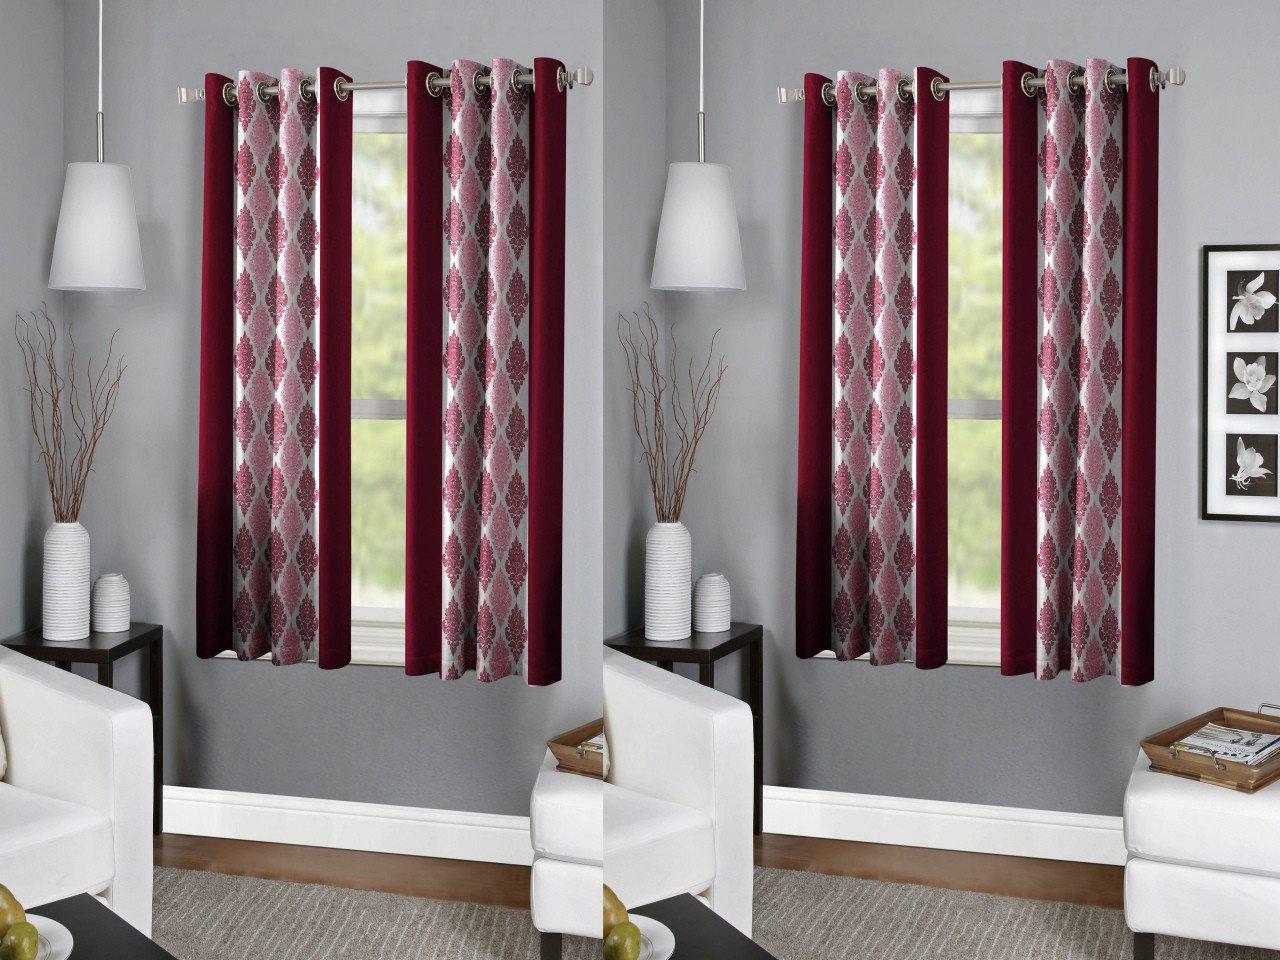 Burgundy Curtains for Bedroom Inspirational Maroon Bedroom — Procura Home Blog